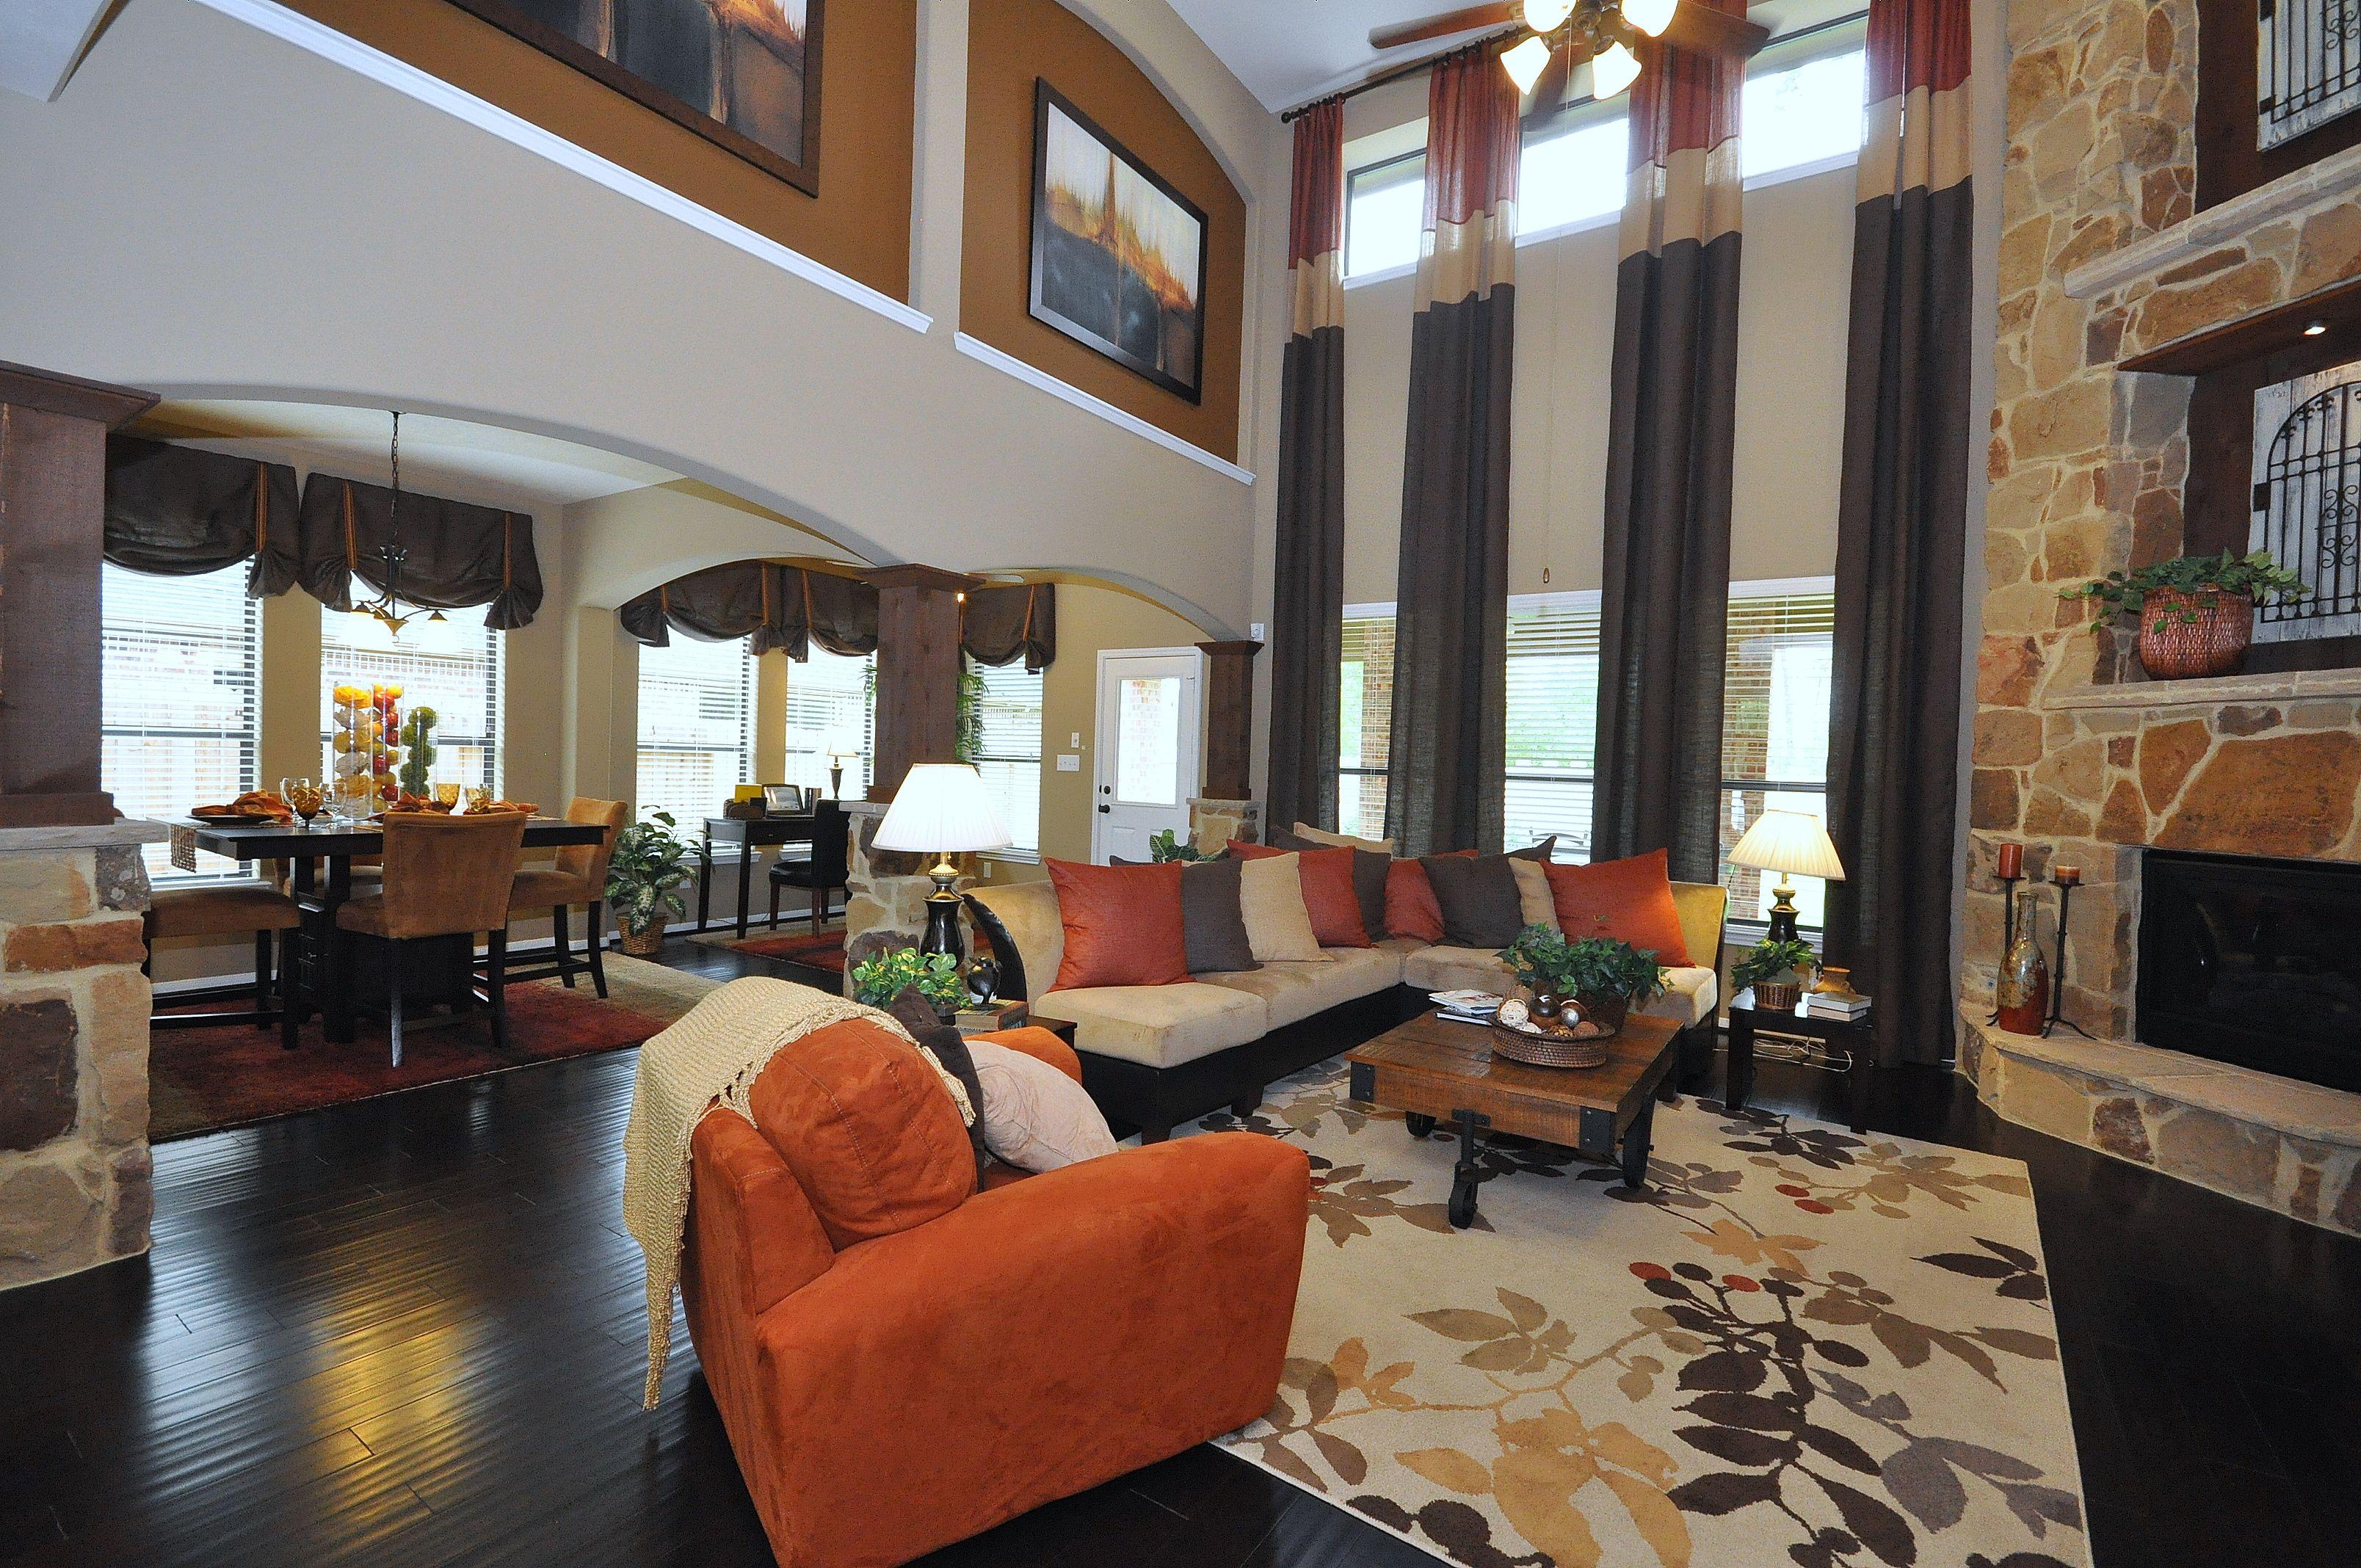 Living Rich On Lessliving Rich On Less: Rich Living Room Colors